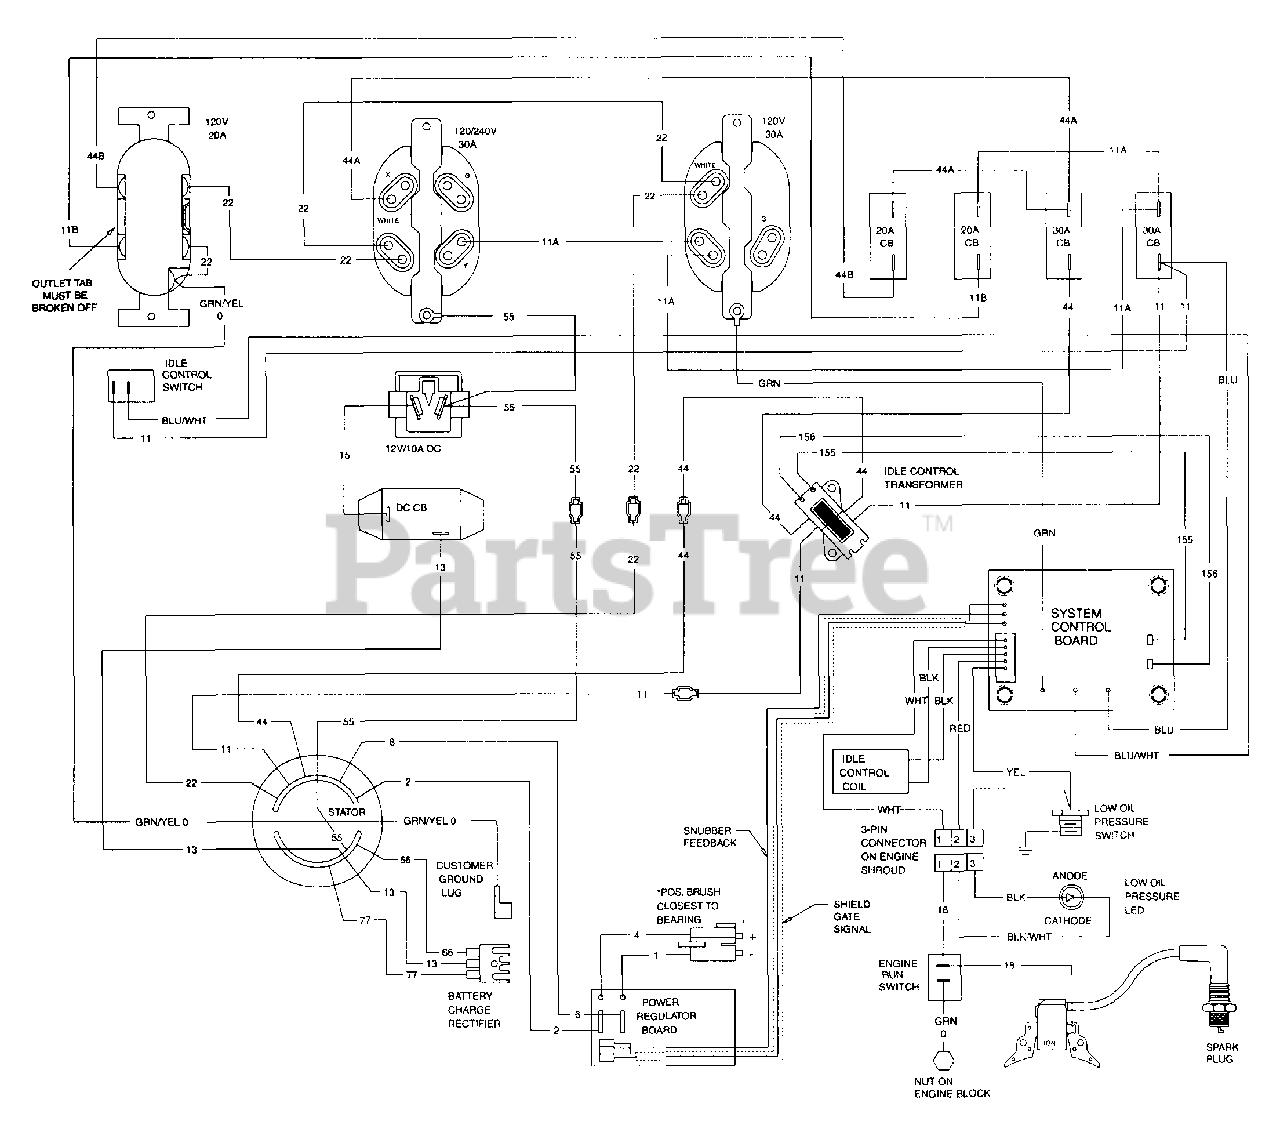 Generac 9778 7 Generac Xl 5 500 Watt Portable Generator Wiring Diagram Parts Lookup With Diagrams Partstree